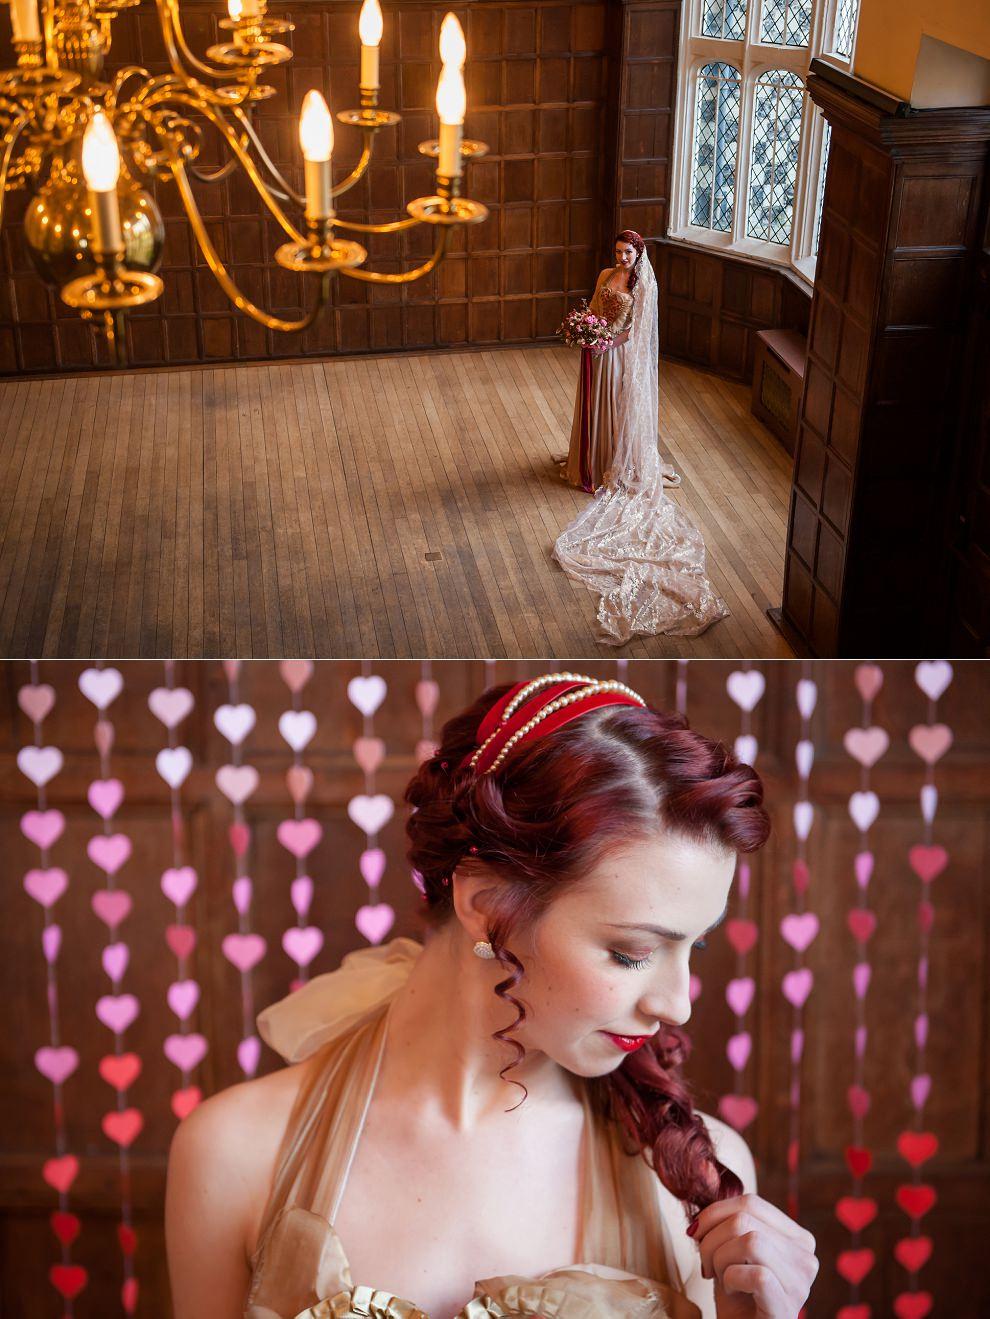 Best-wedding-photos-UK-2015-023